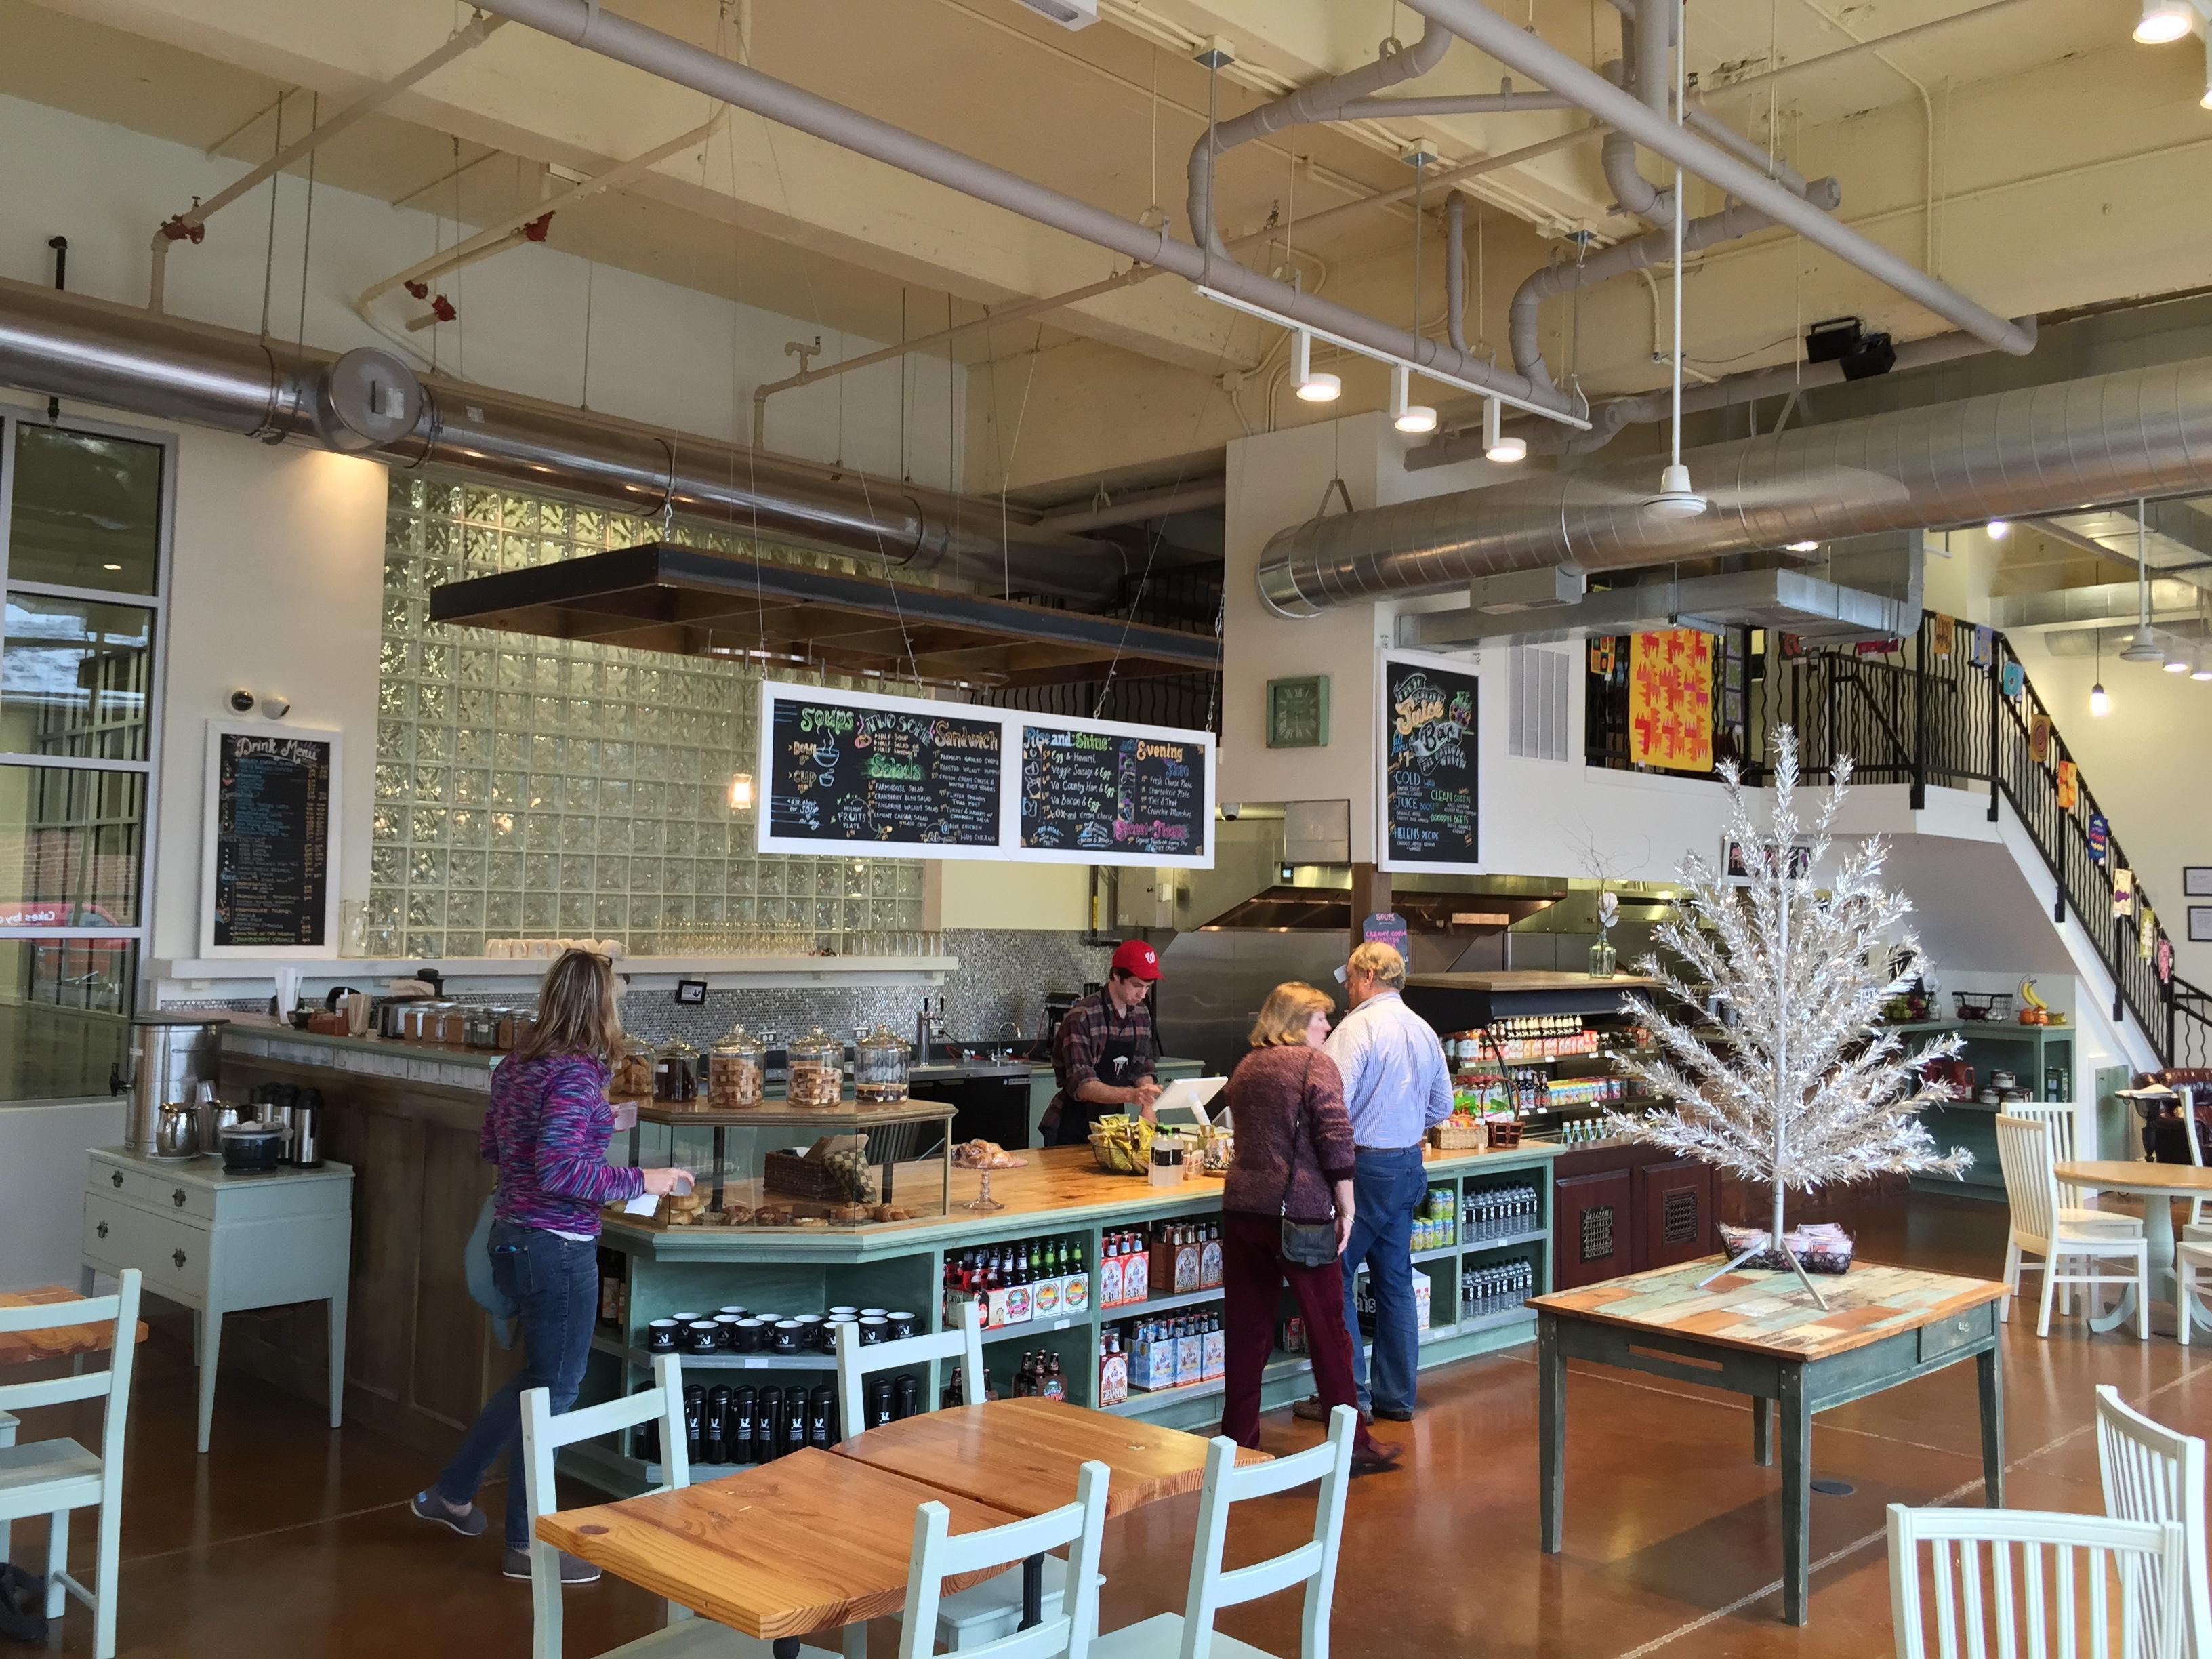 photos: the urban farmhouse market & café opens in scott's addition